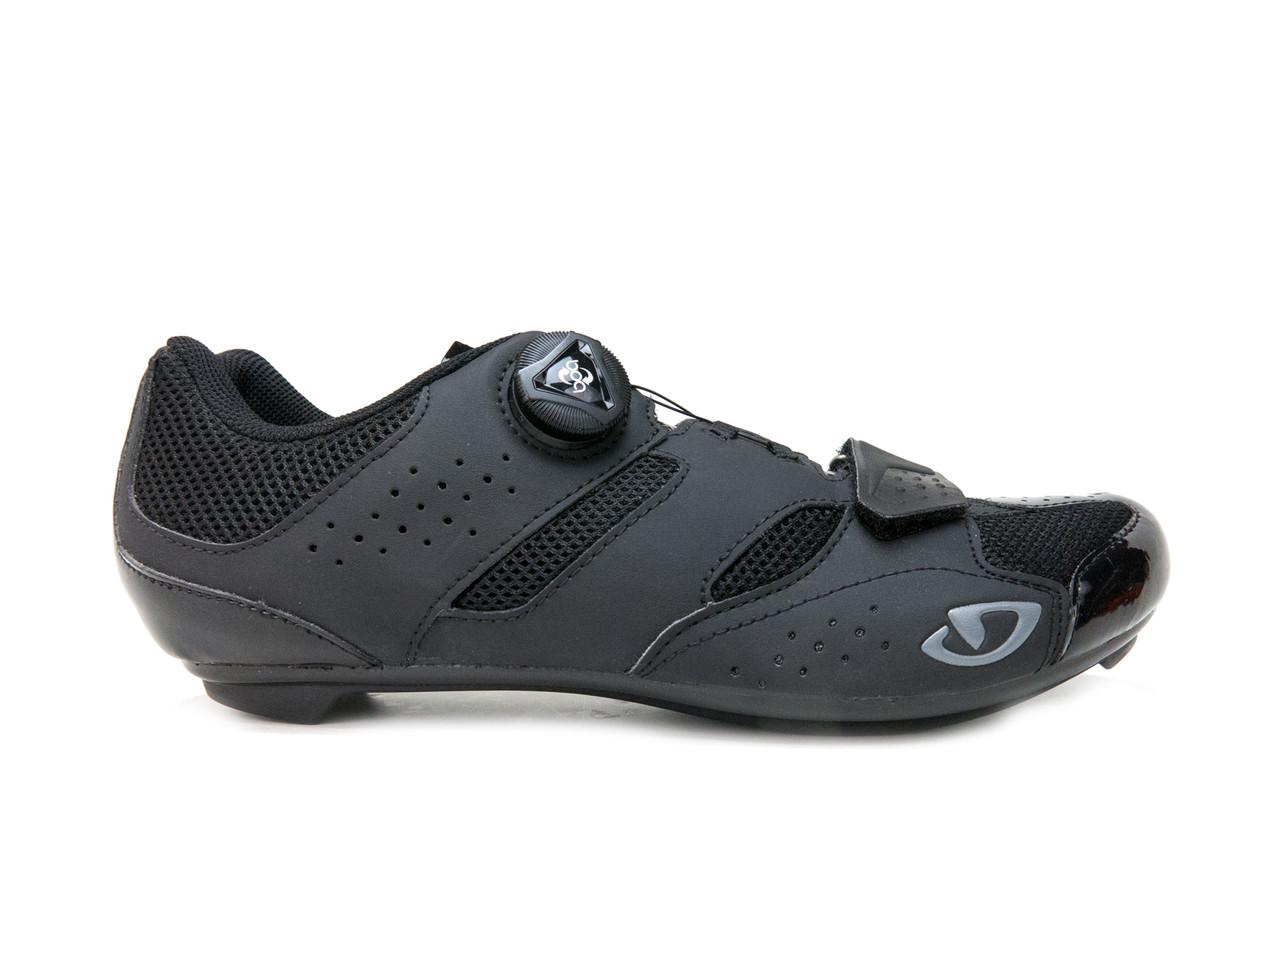 Giro Savix HV SPD BOA Road Bike Shoes Black